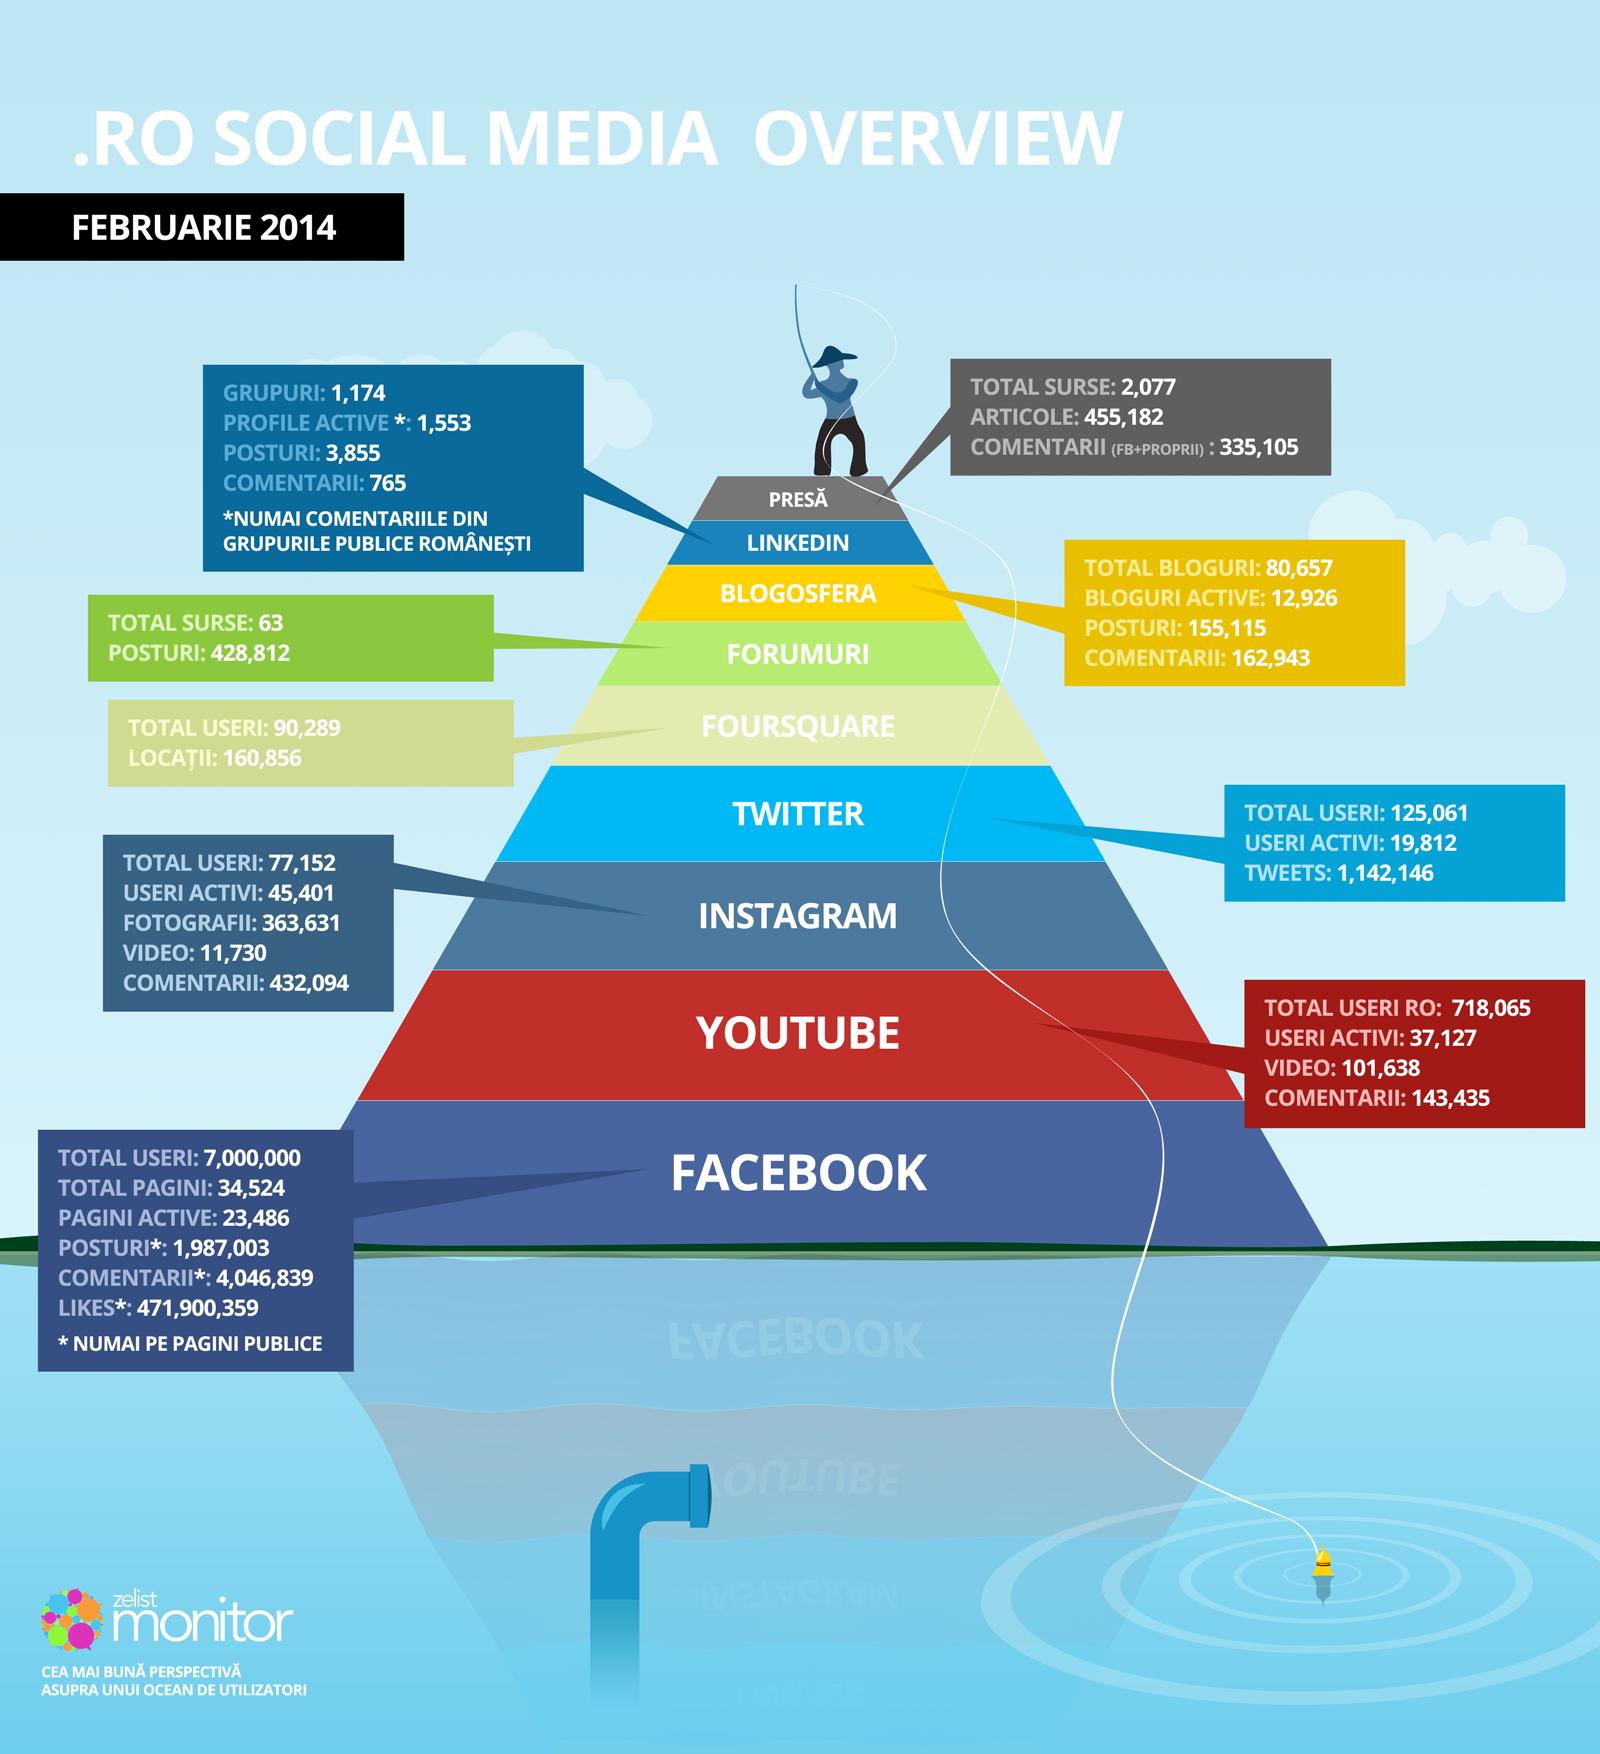 Overview social media Februarie 2014